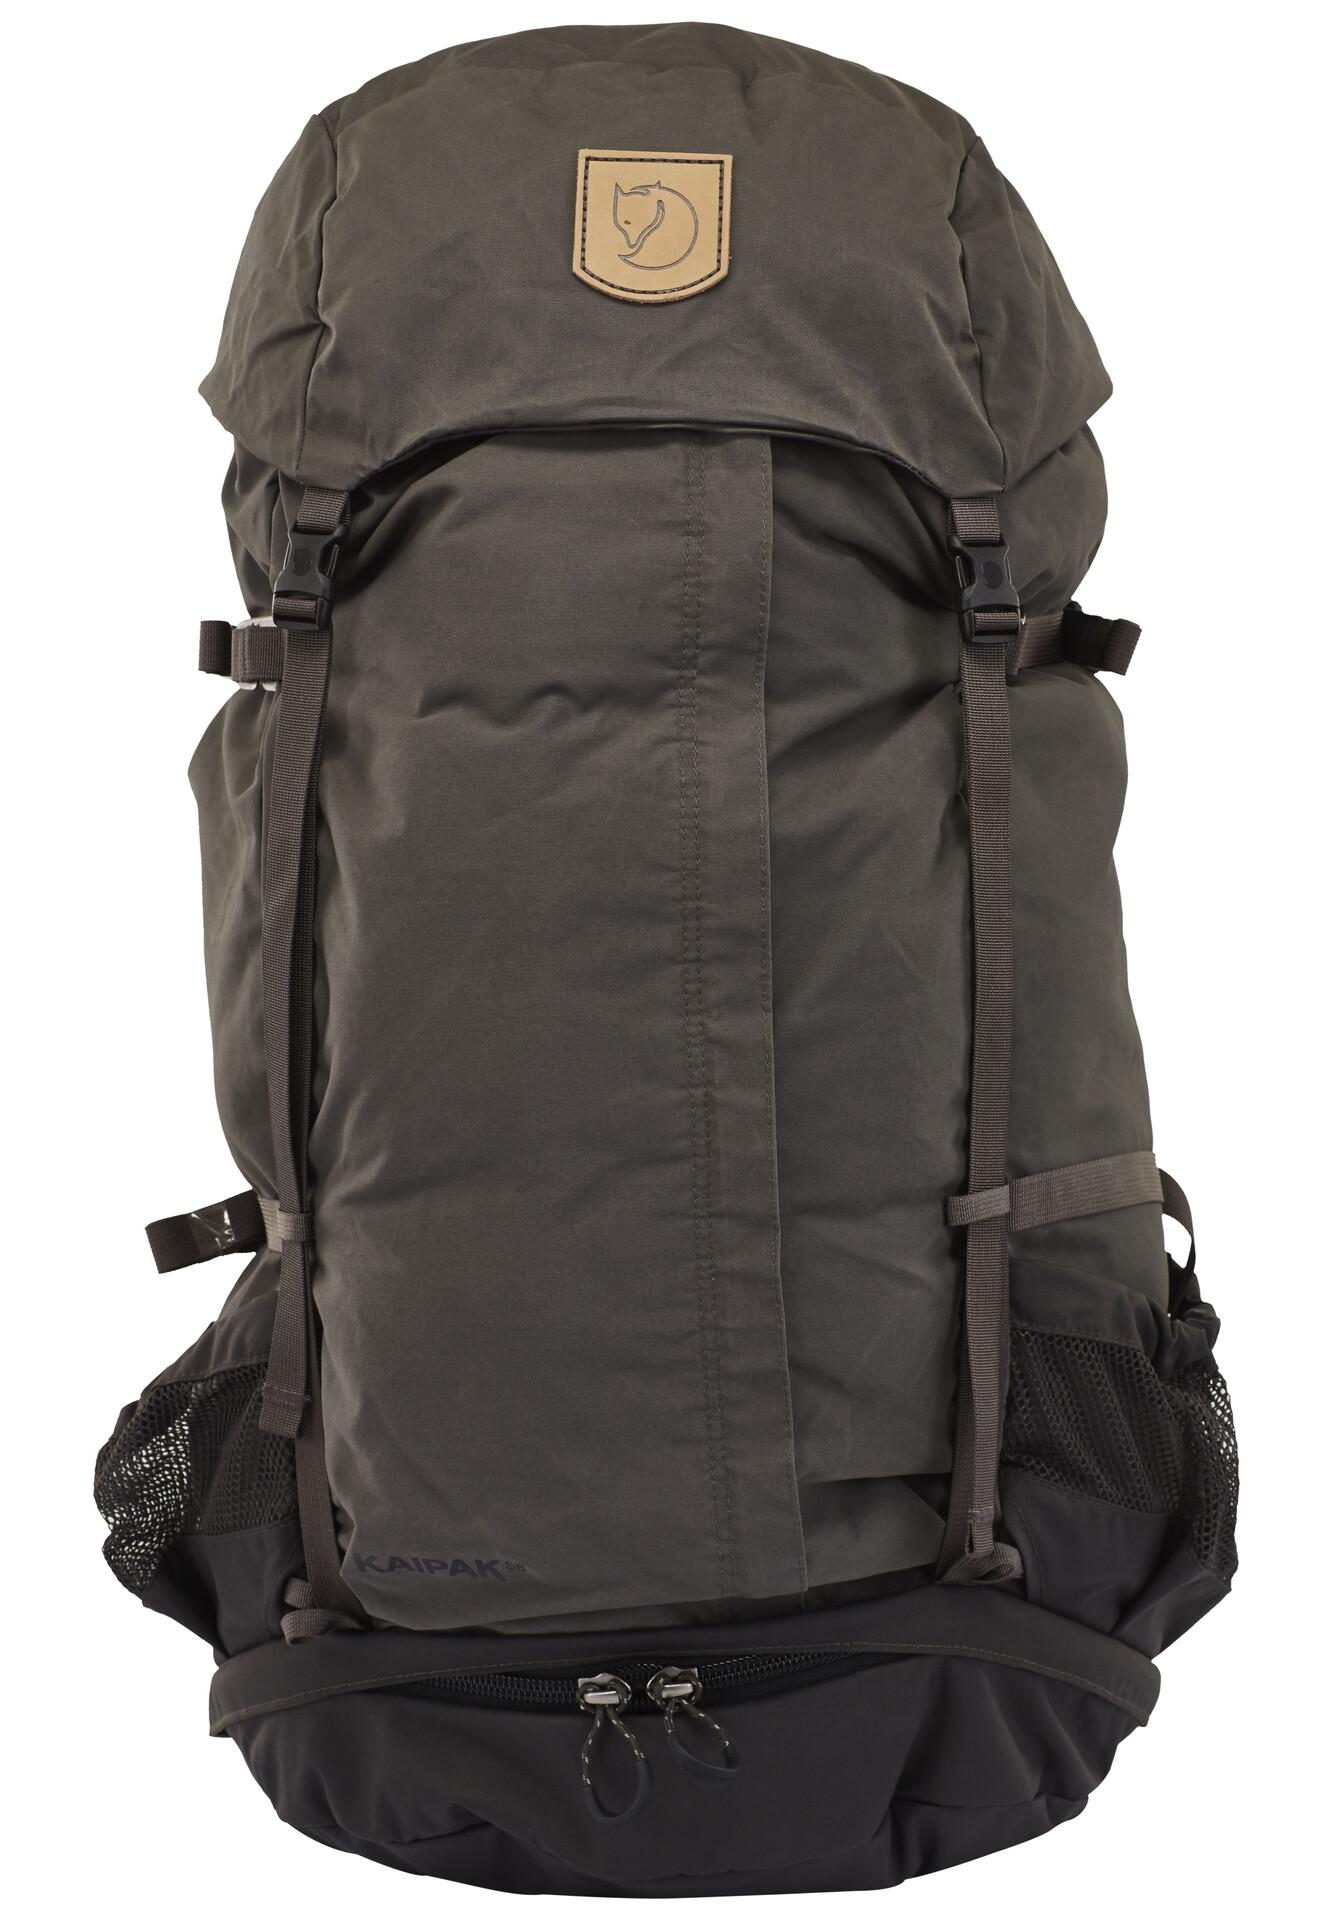 Mens backpack Fj/ällr/även Kaipak 58